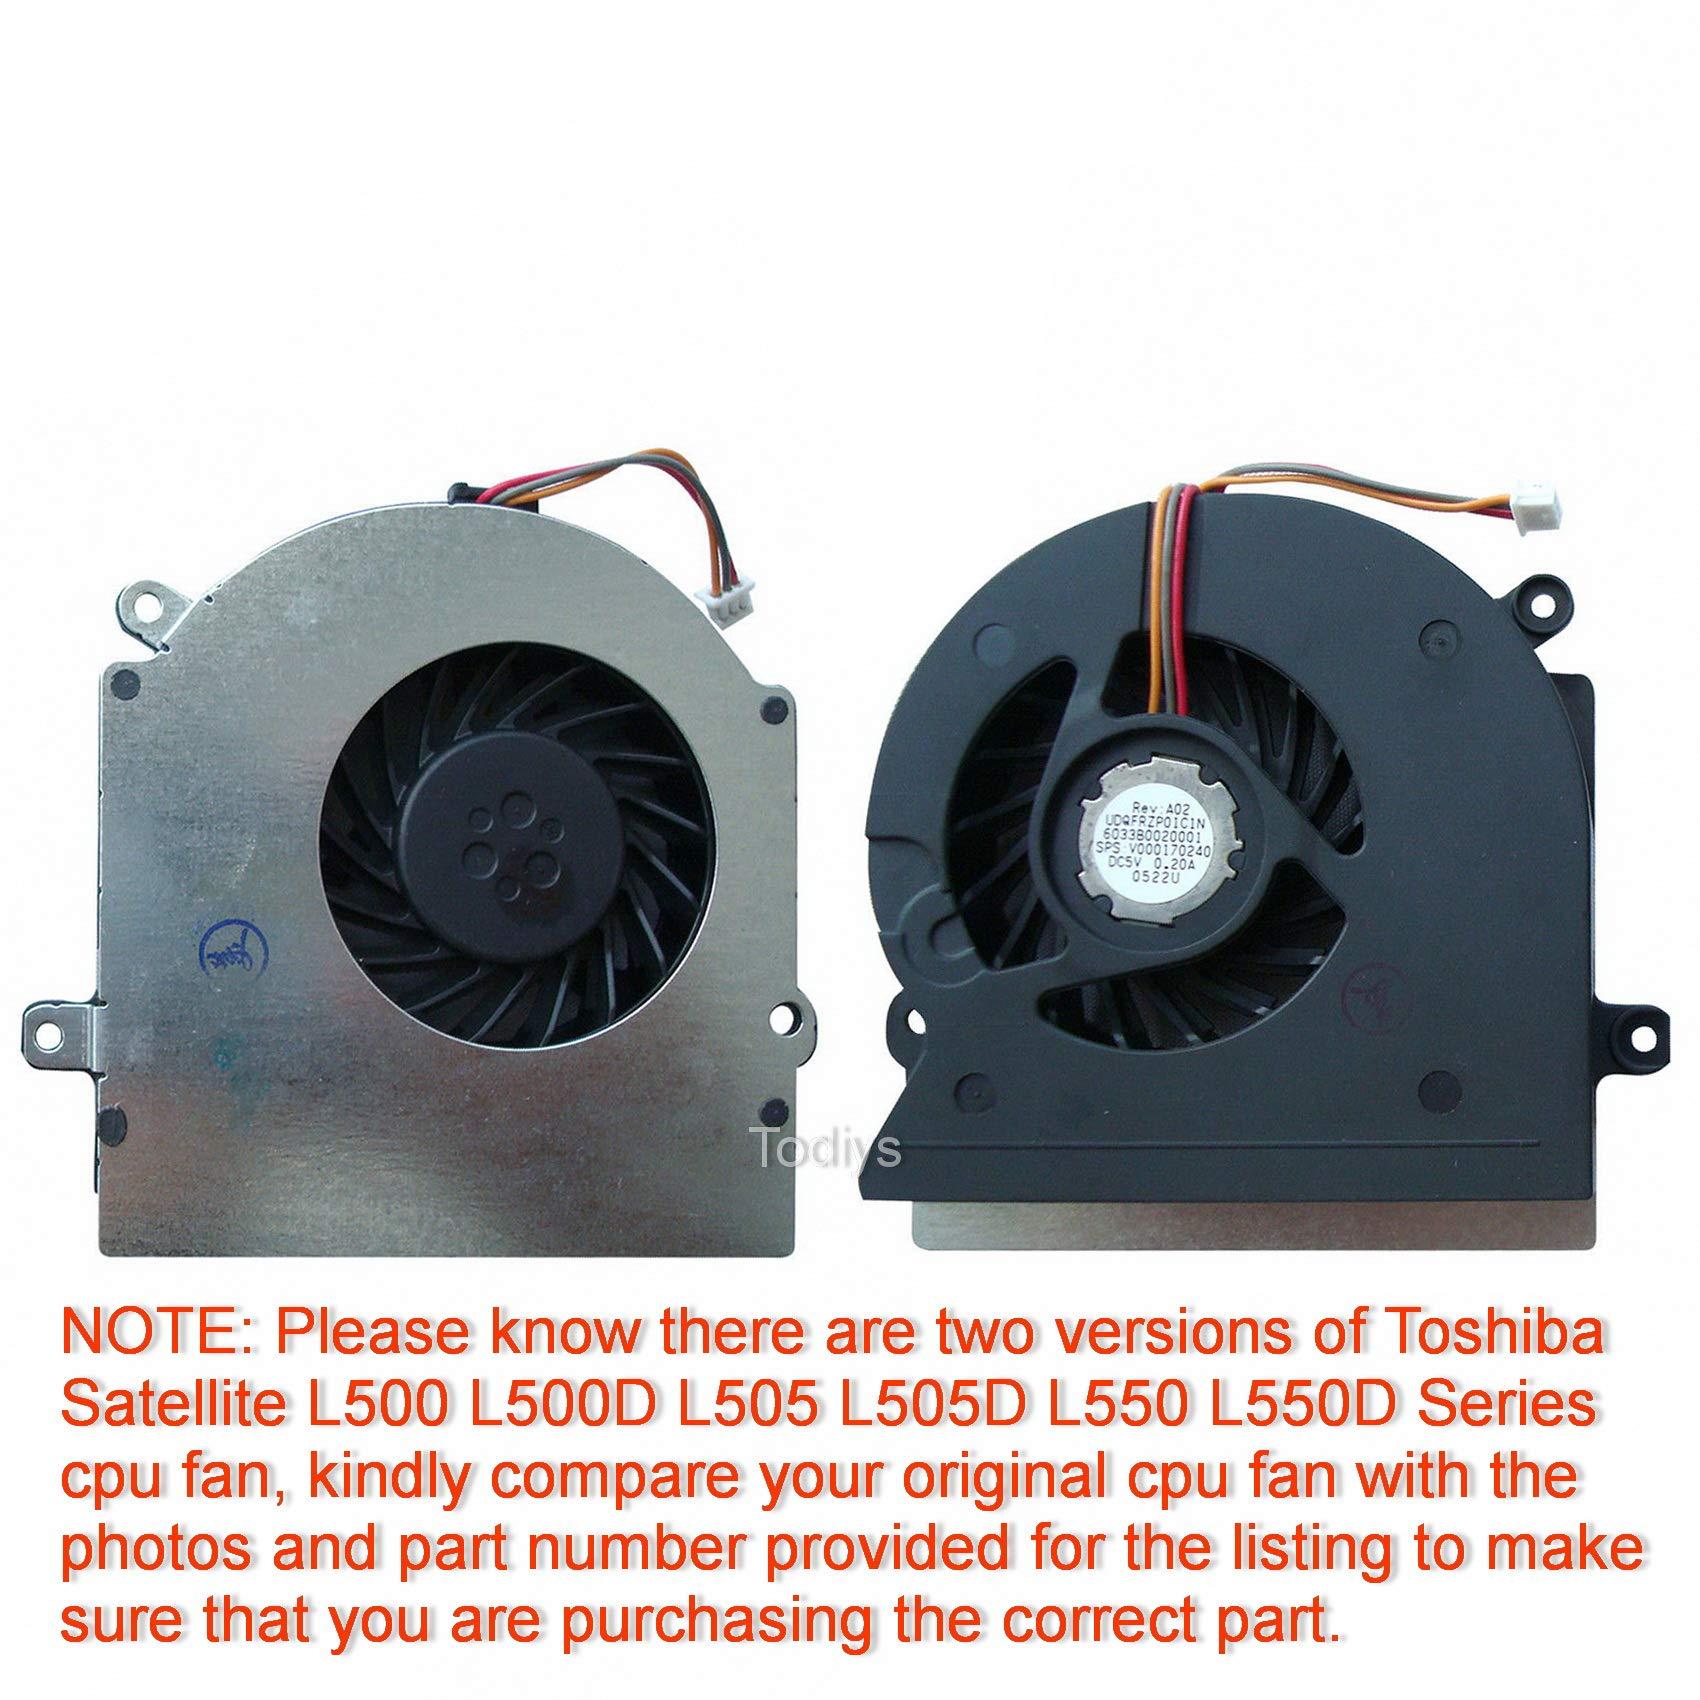 Cooler Para Toshiba Satellite L500 L500d L505 L505d L550 L550d Series L500-017 L500-st5505 L500d-11p L505-11d L505-s6953